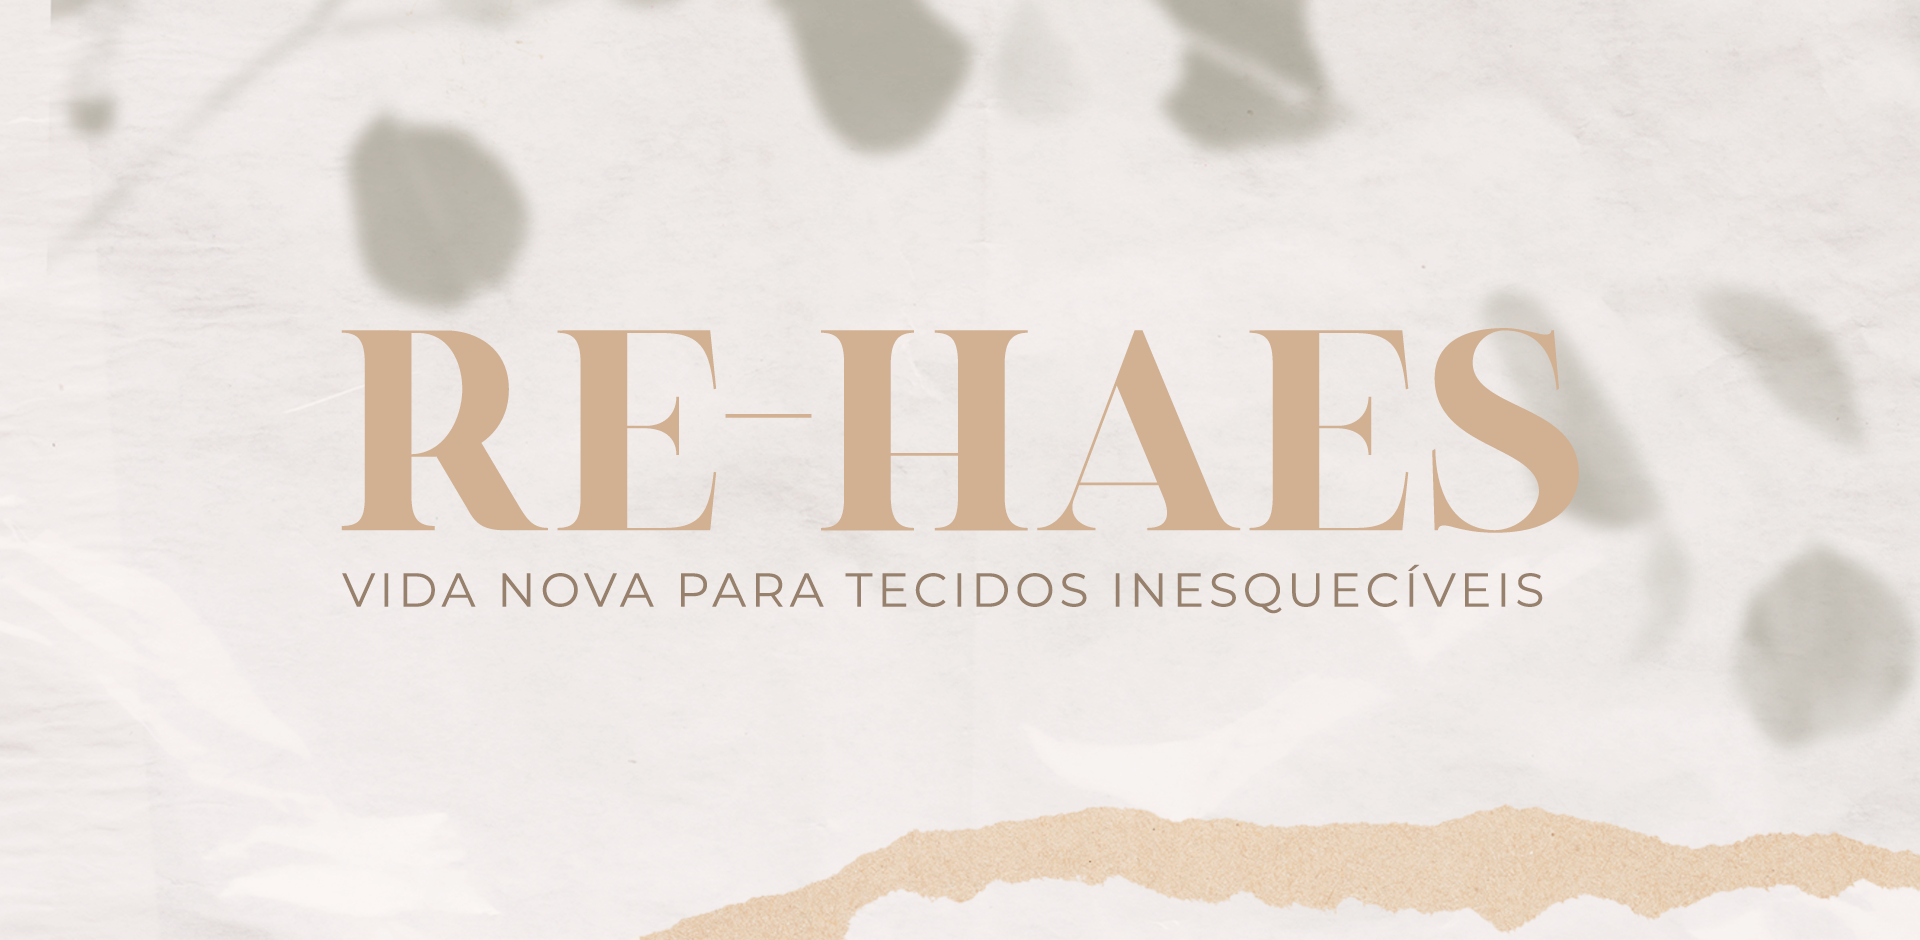 Re - Haes